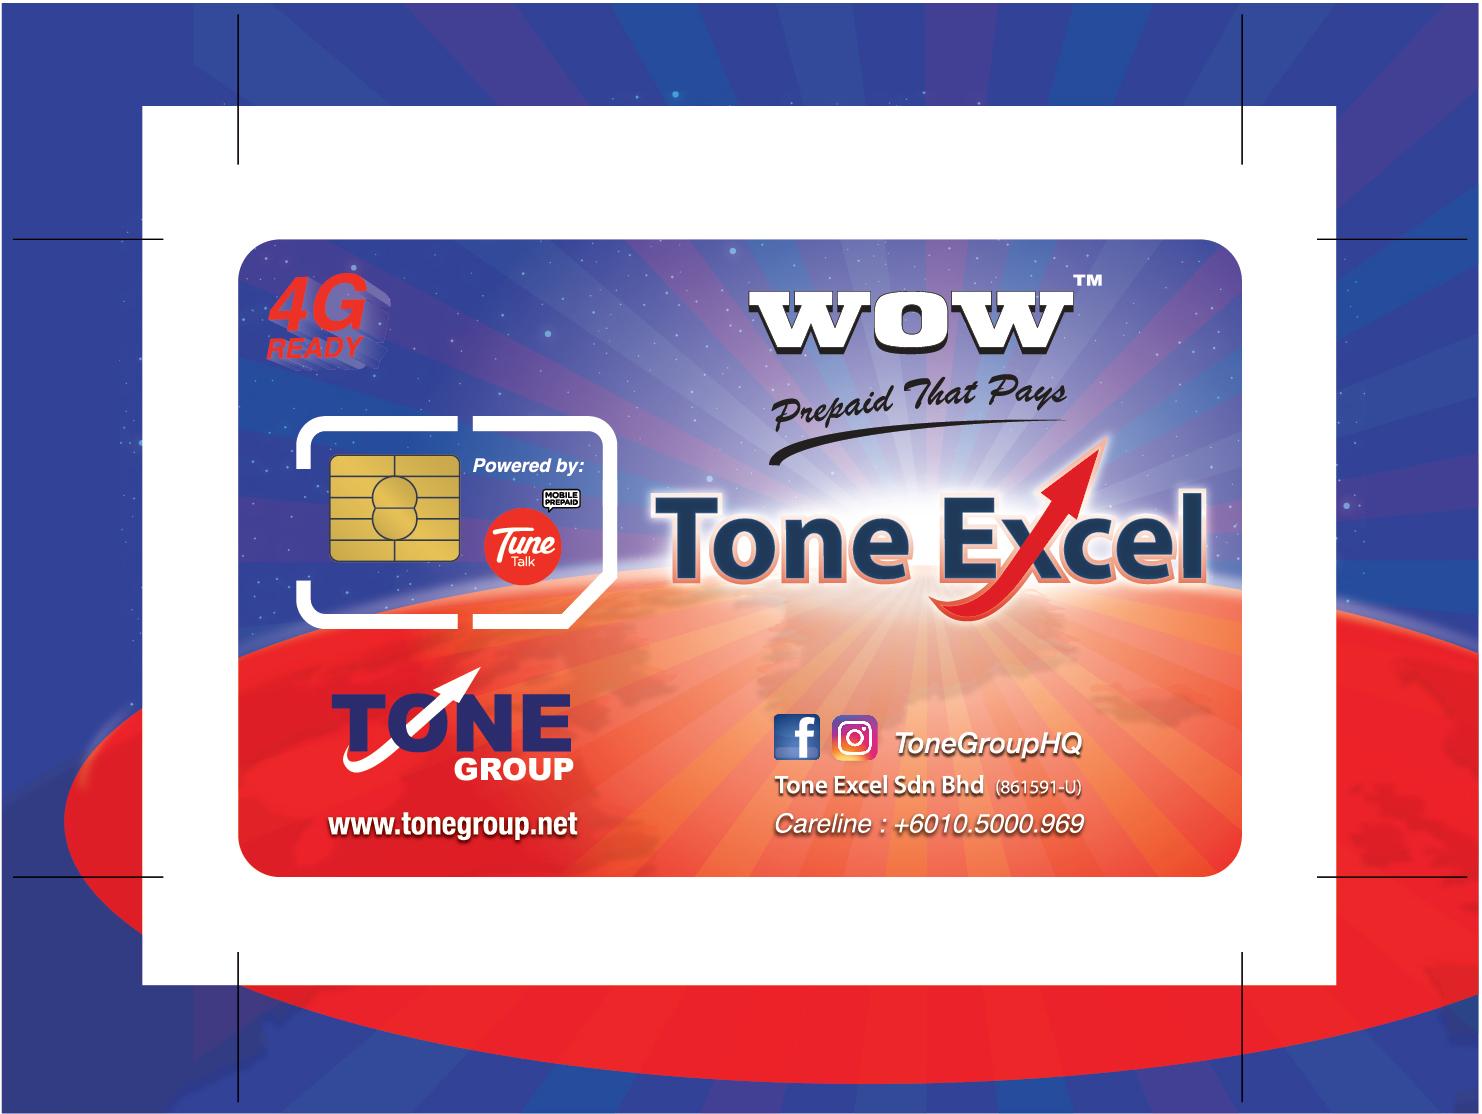 Tone Excel